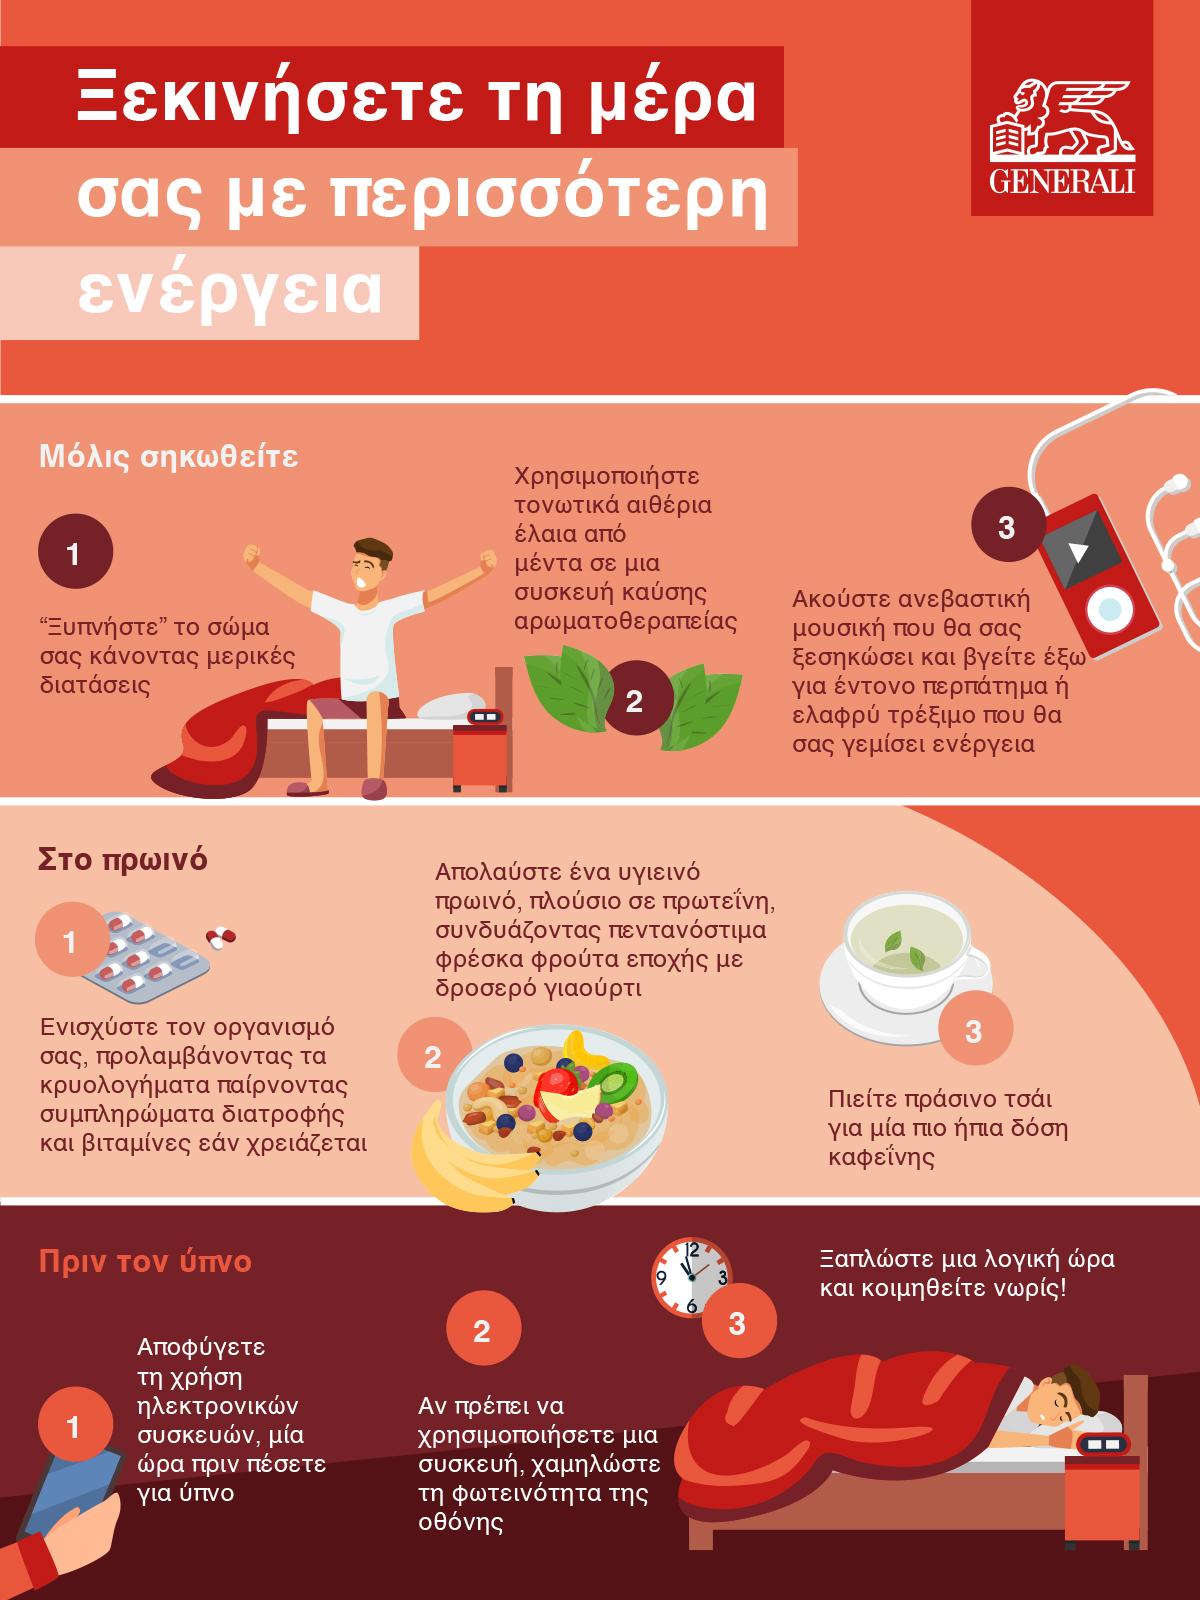 Generali_Kickstart Your Day_Infographic_Greece.jpg